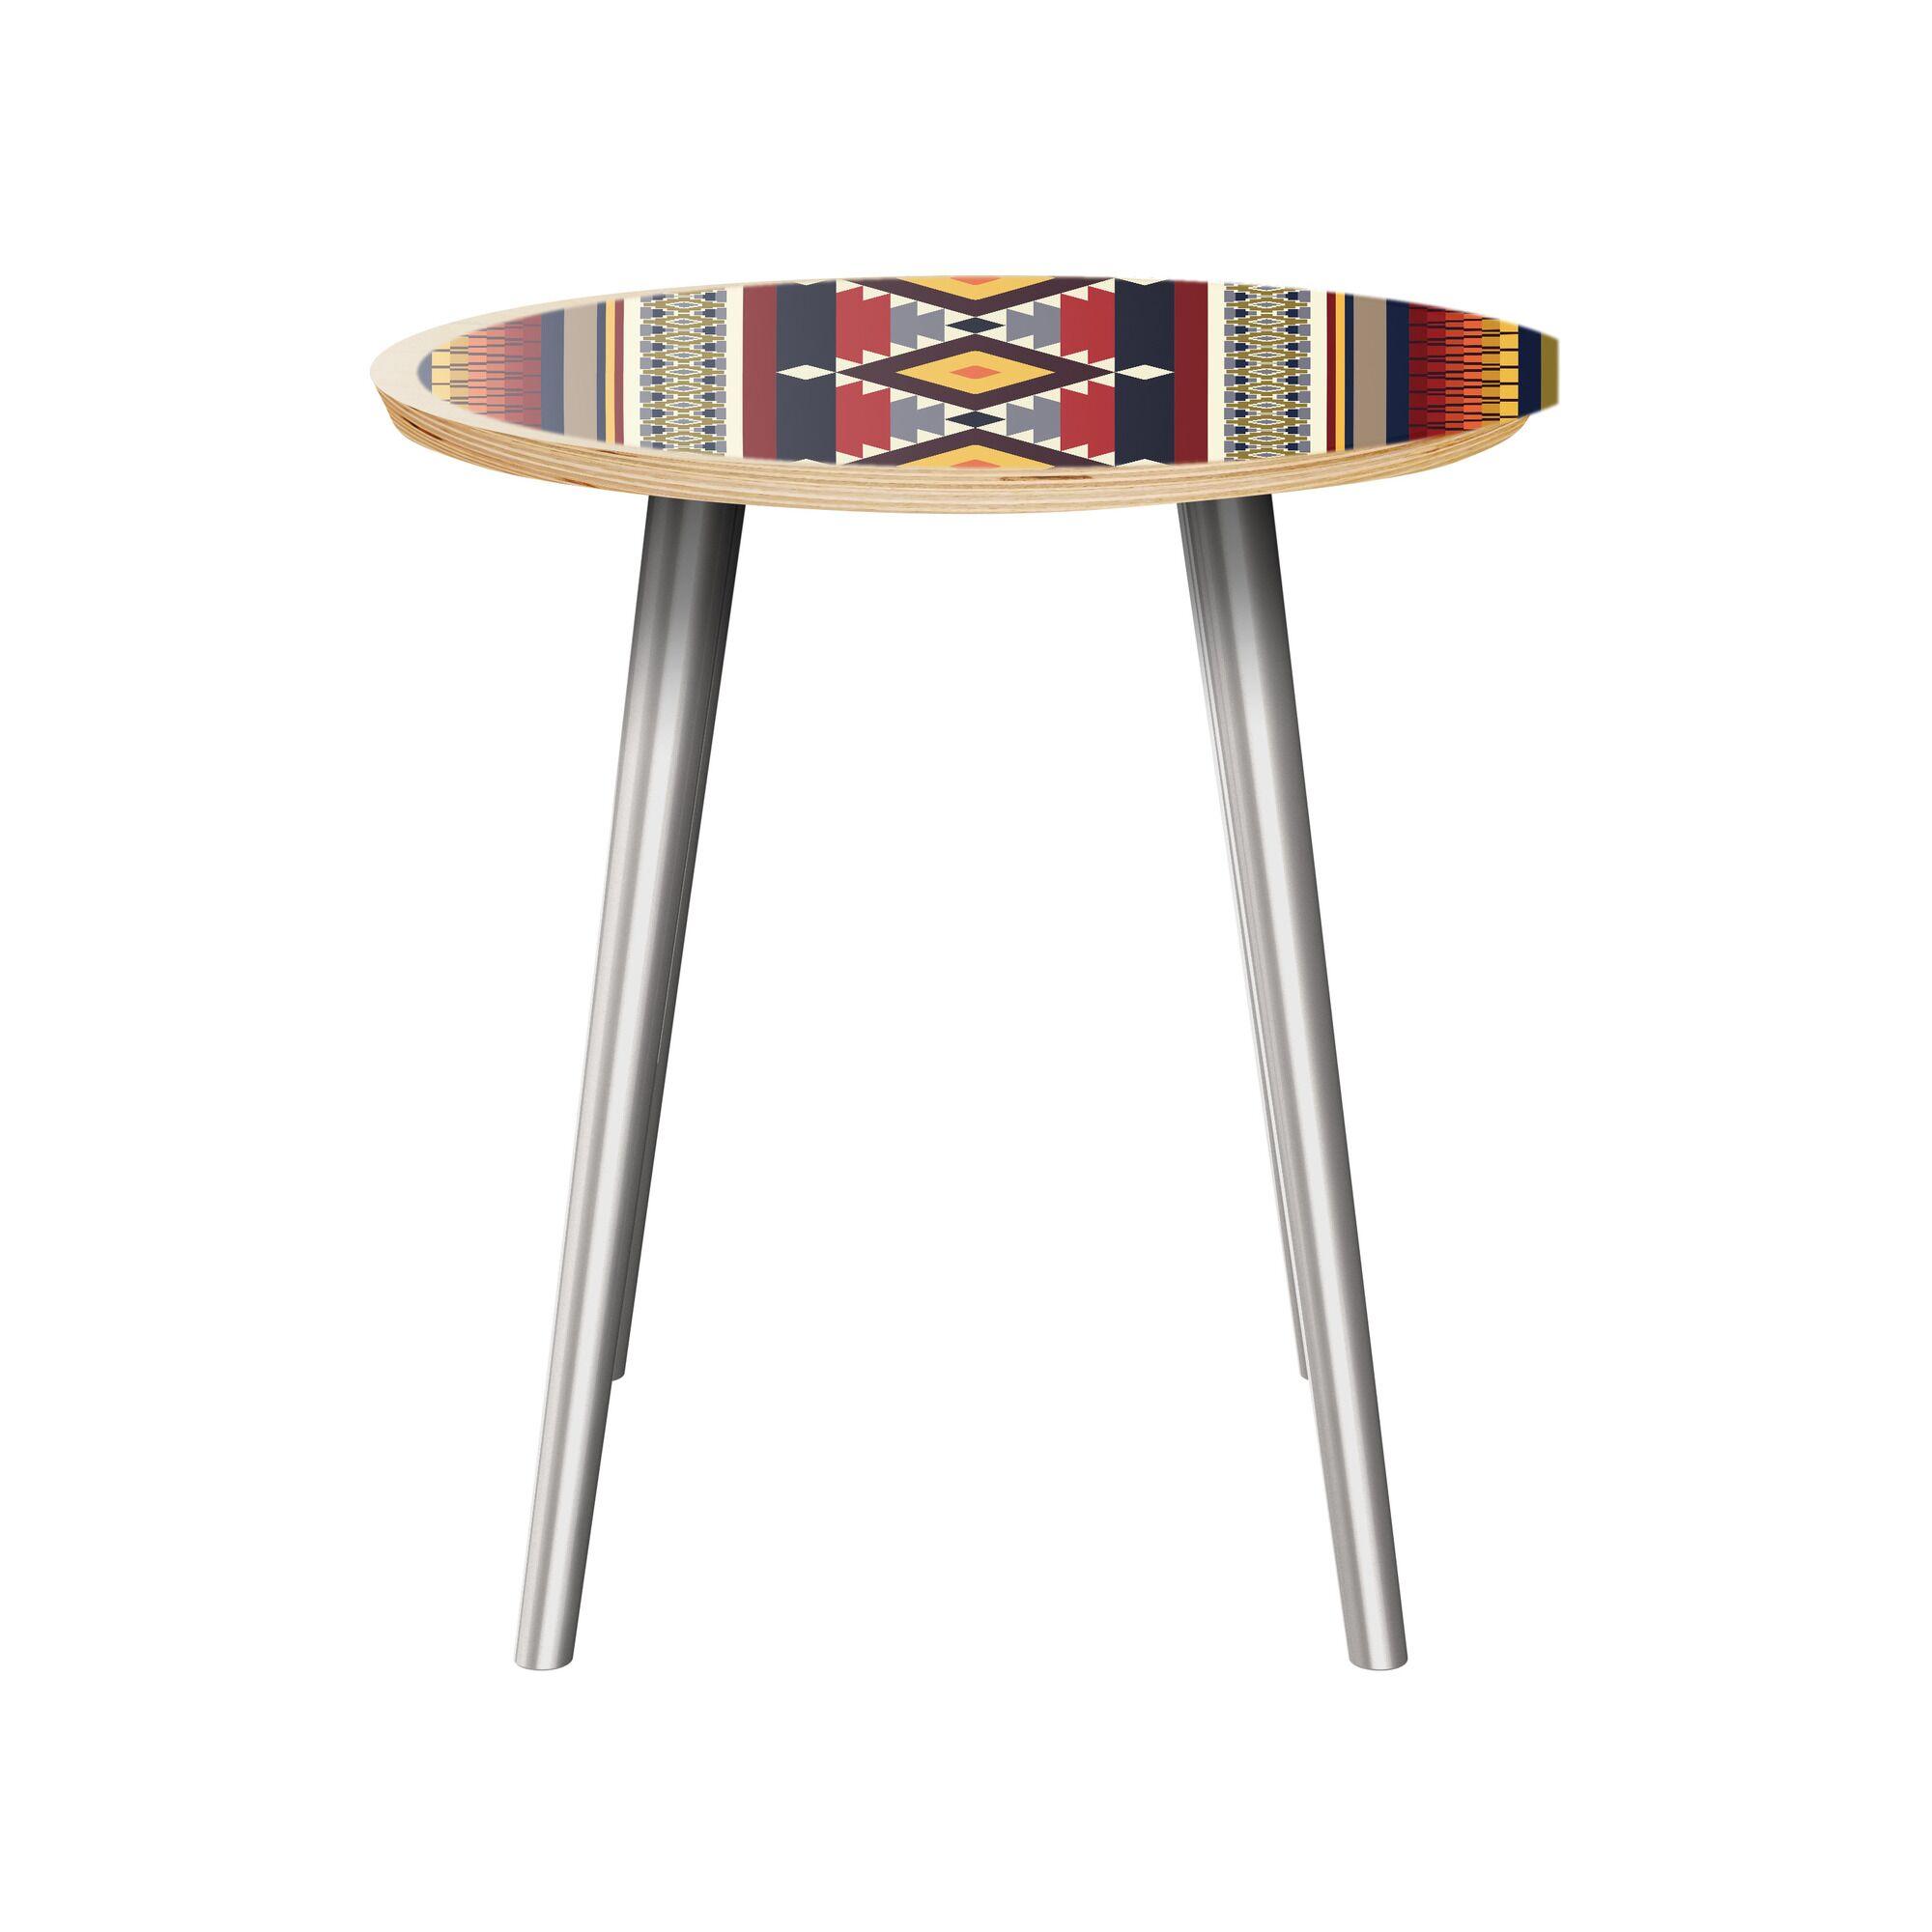 Kristan End Table Table Top Color: Natural, Table Base Color: Chrome